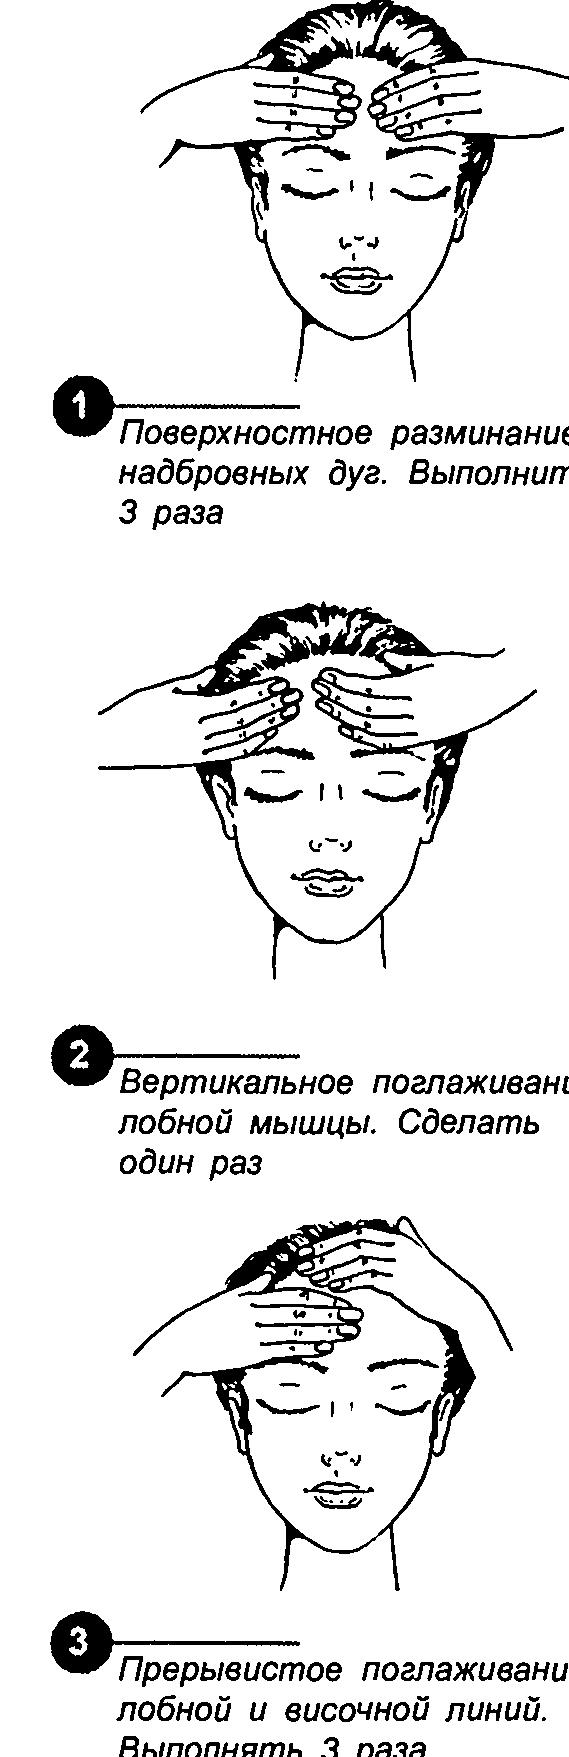 https://klow.ru/images/24112009-7.png